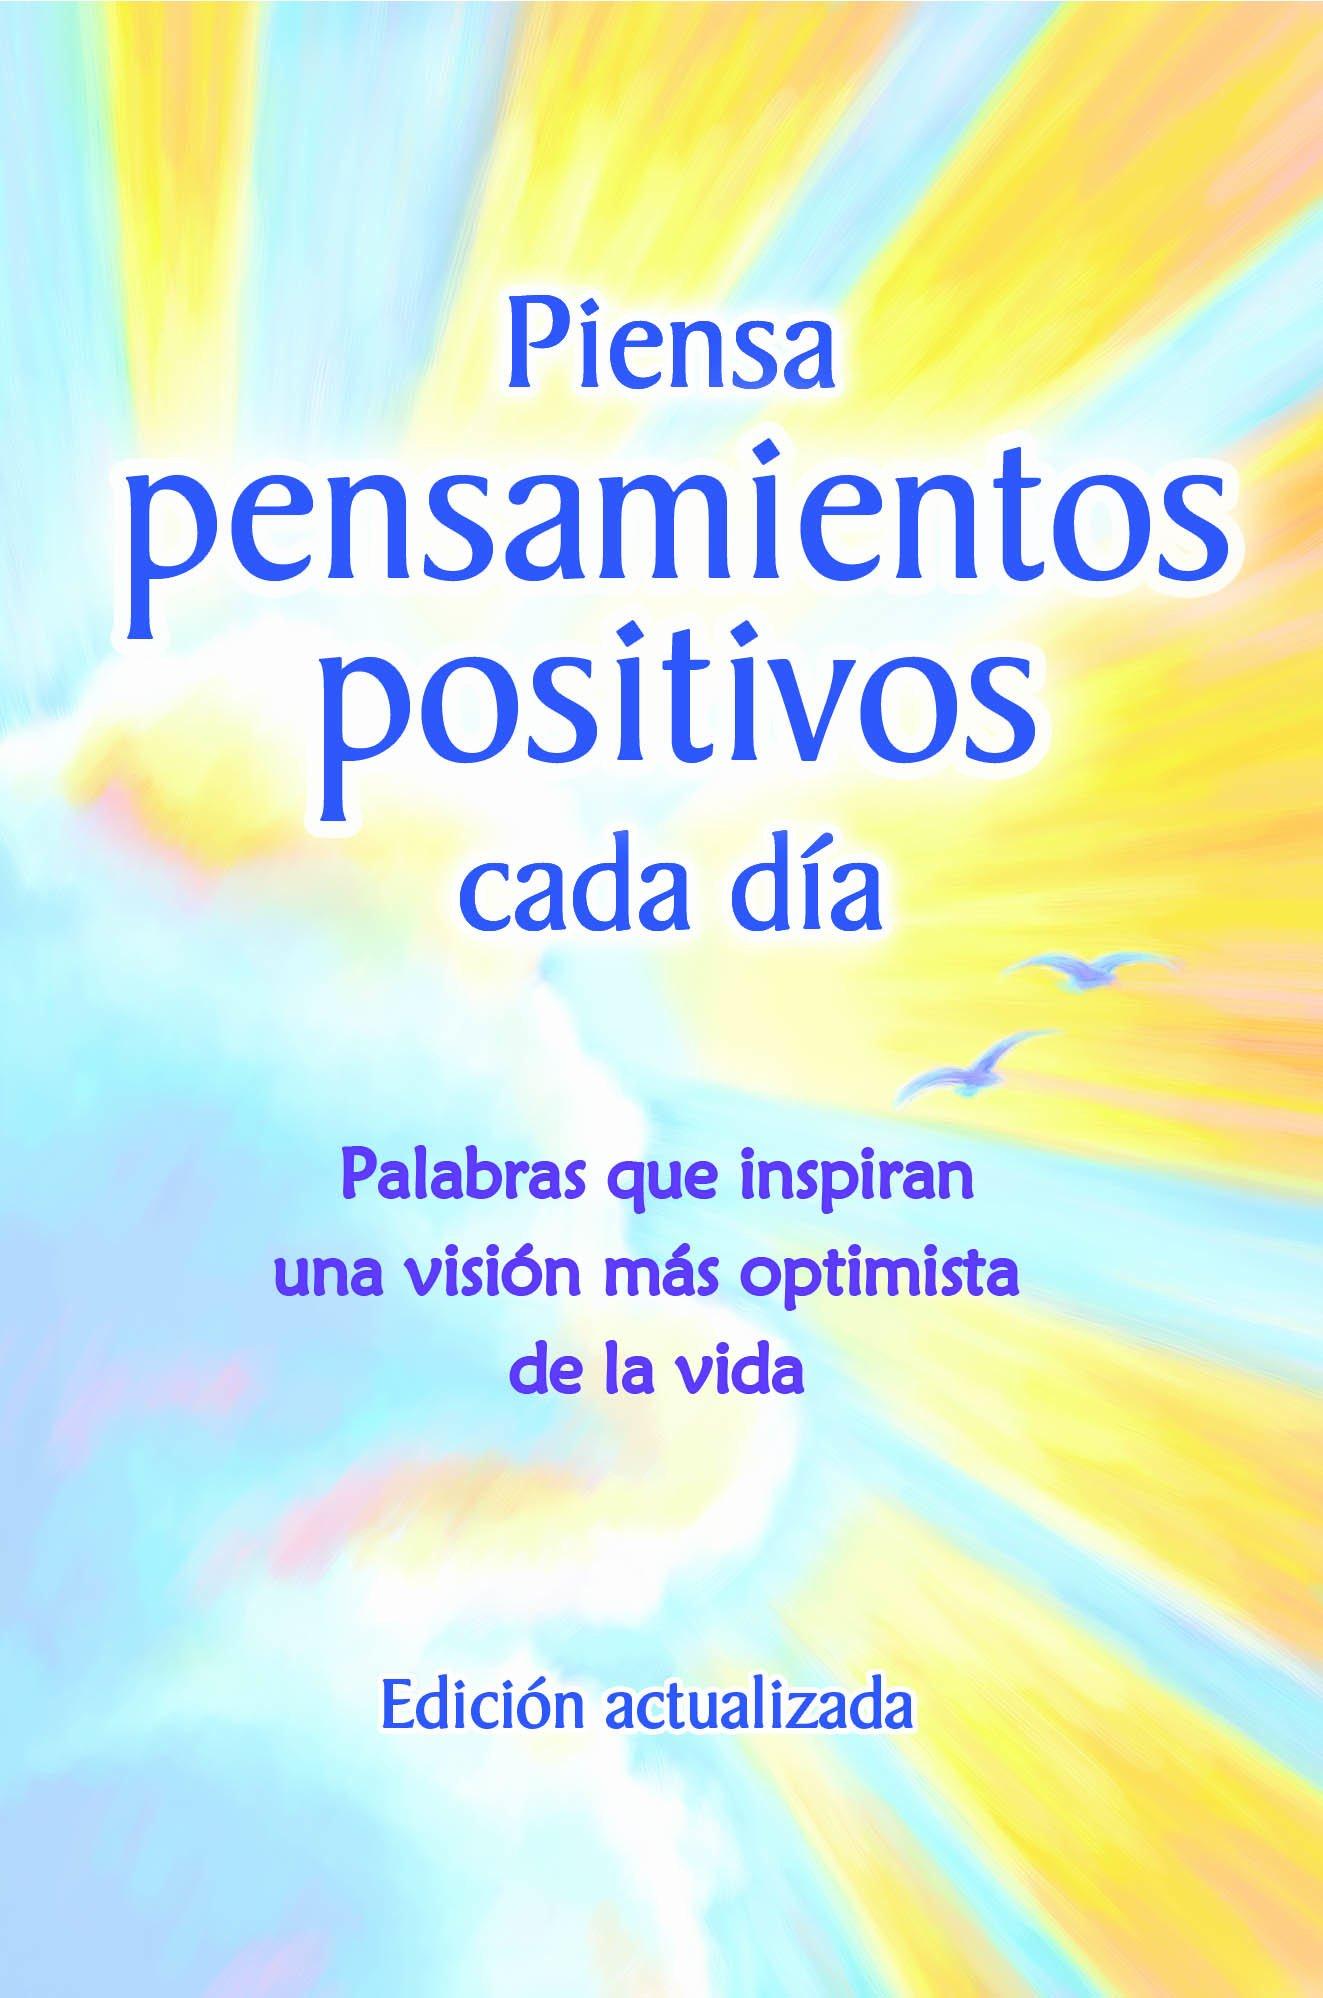 Download Piensa pensamientos positivios cada dia (Edicion actualizada) / Think Positive Thoughts Every Day (Updated Edition) (Spanish Edition) pdf